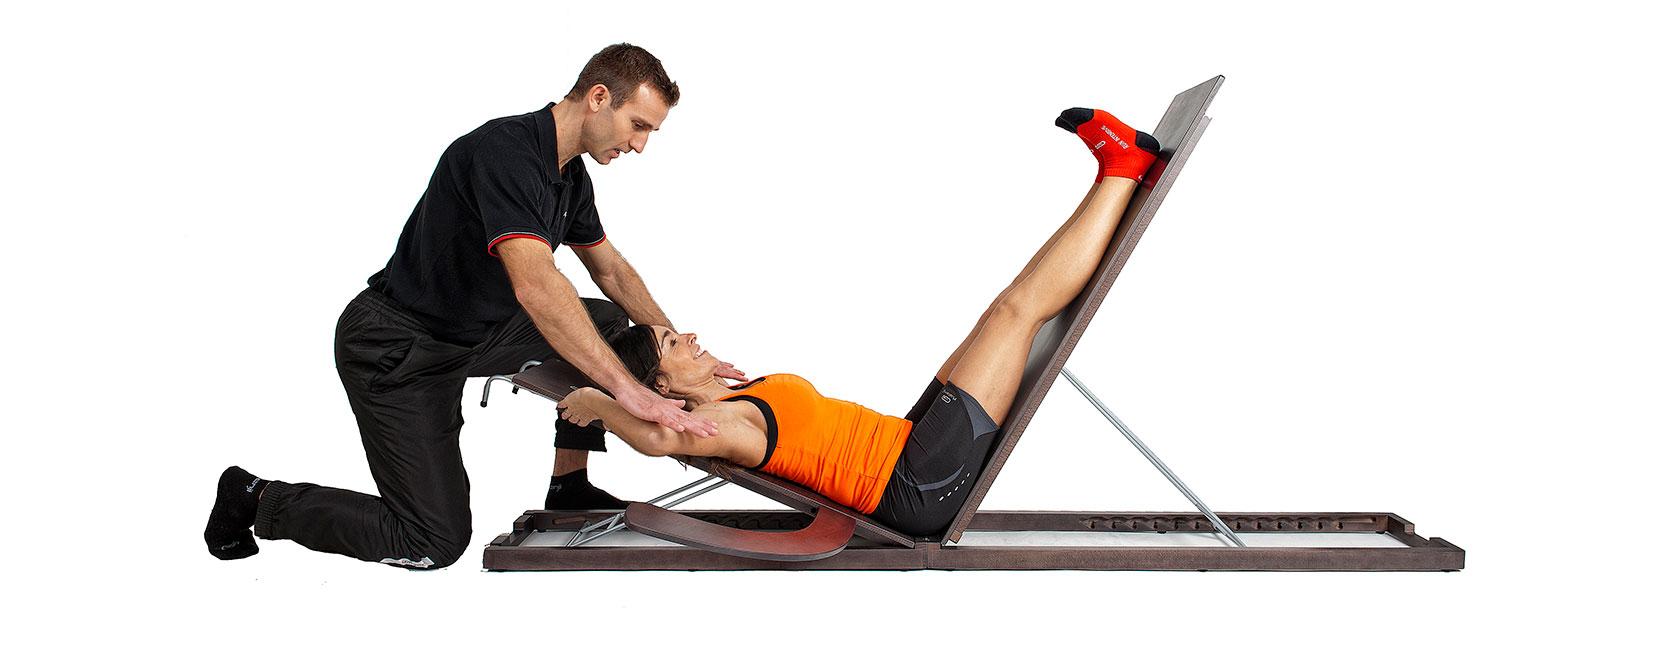 Una postura adecuada, evita dolores, lesiones y dolores articulares.